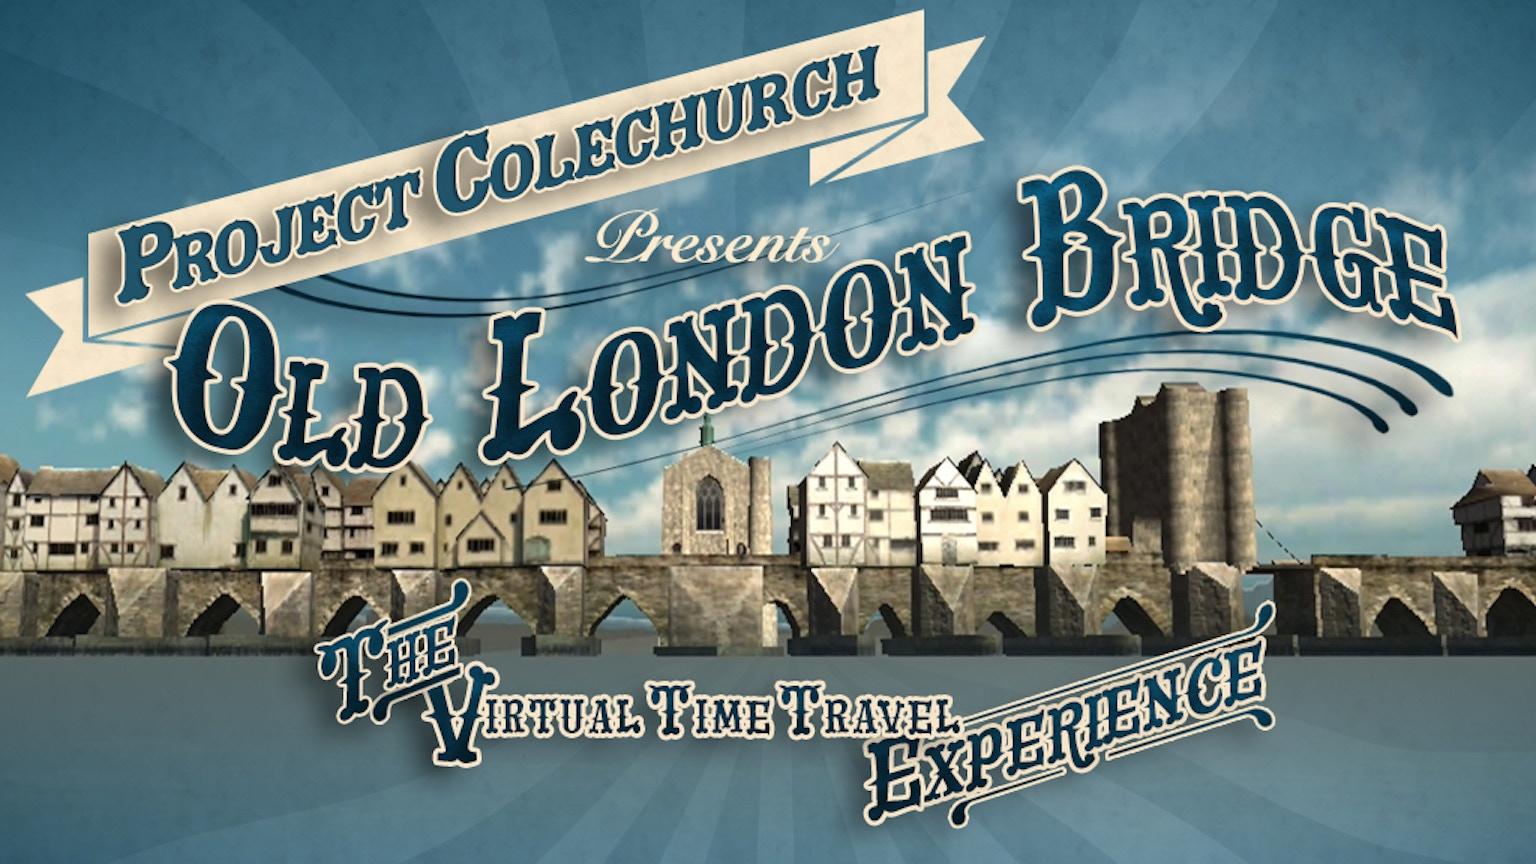 Old london bridge the virtual timetravel experience by for Charity motors bridge card